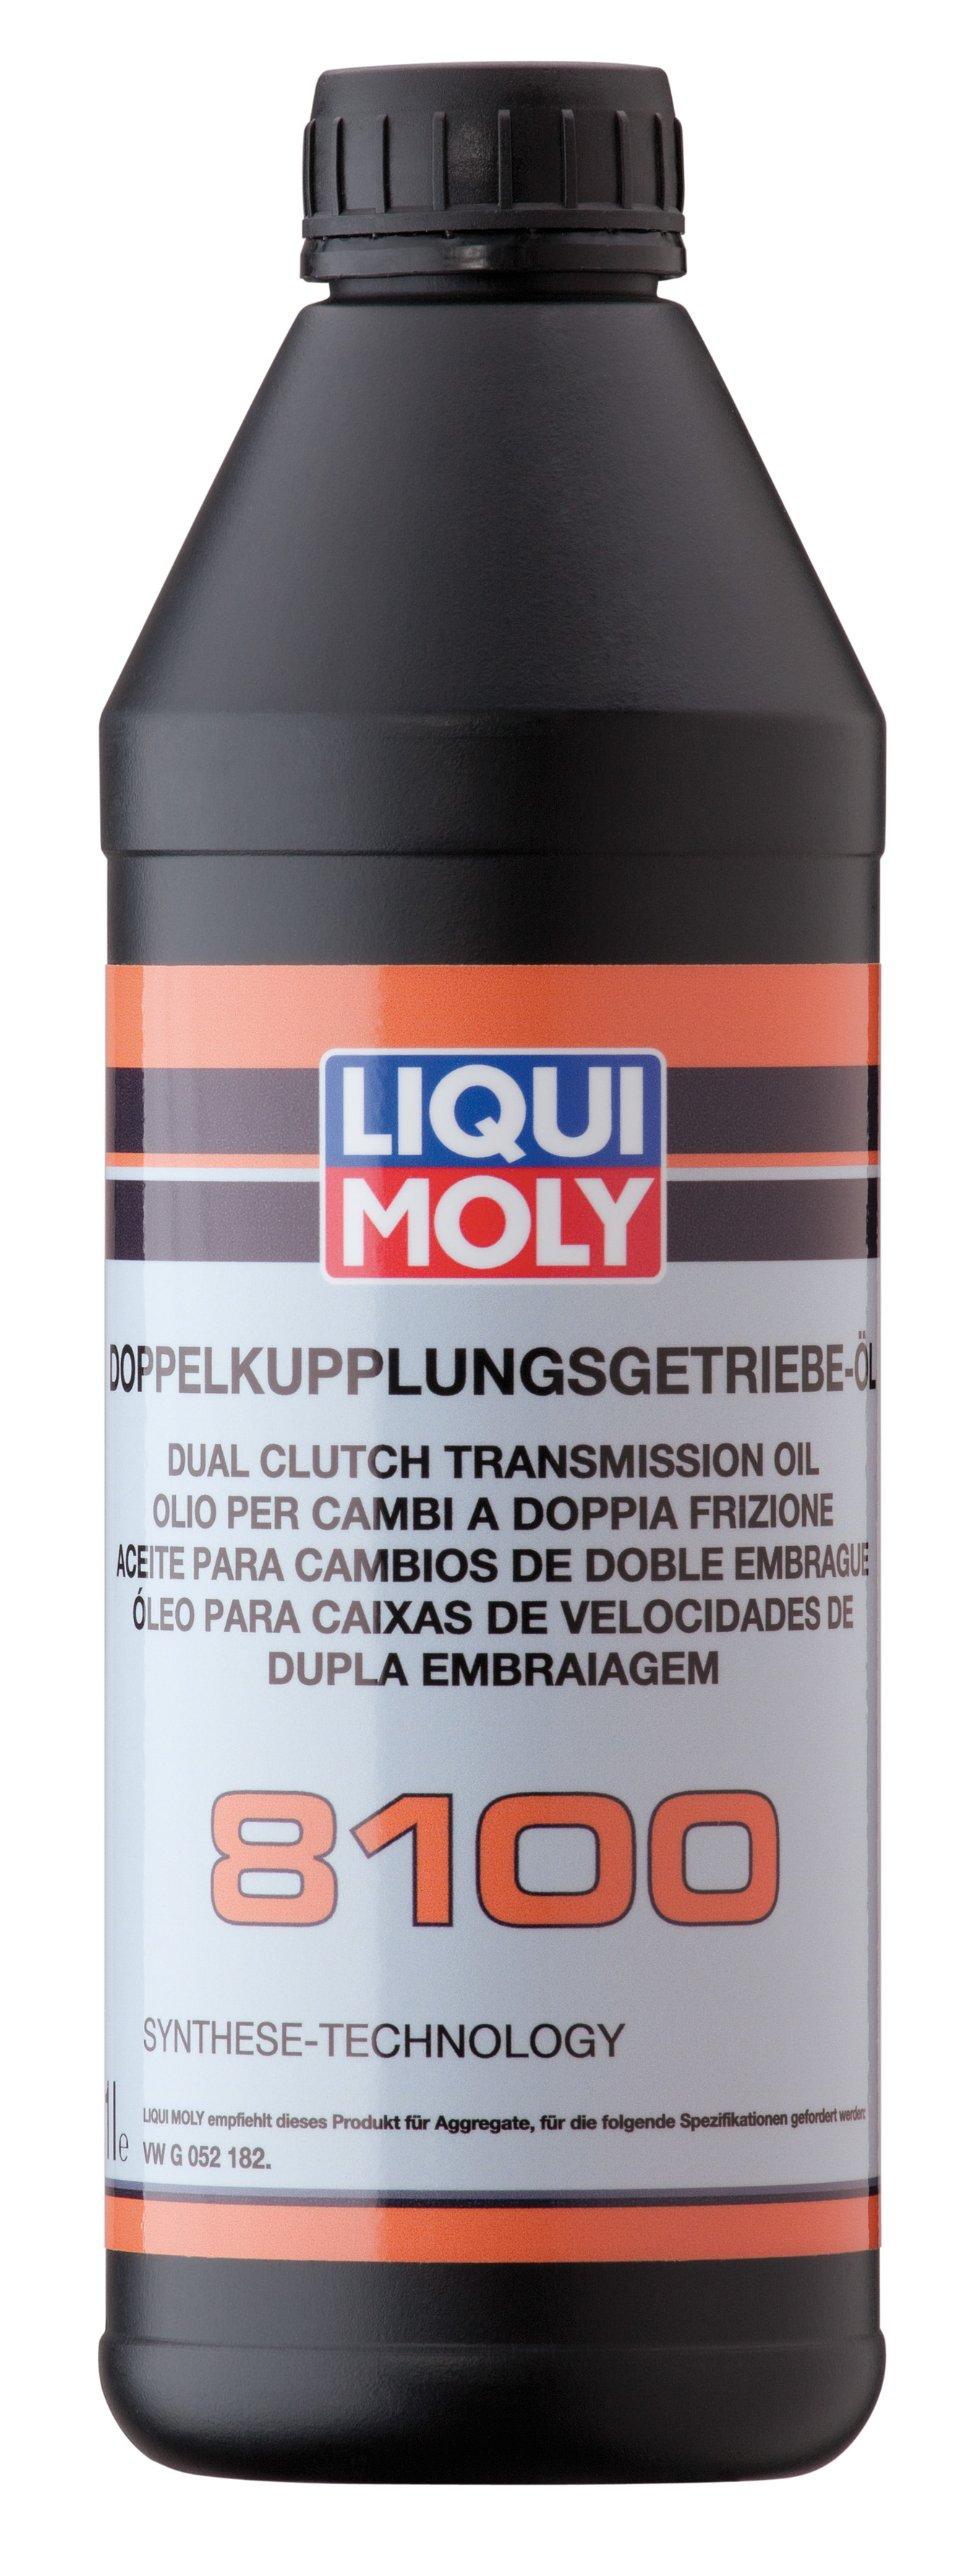 Liqui Moly 20044 Dual Clutch Gear Oil - 1 Liter